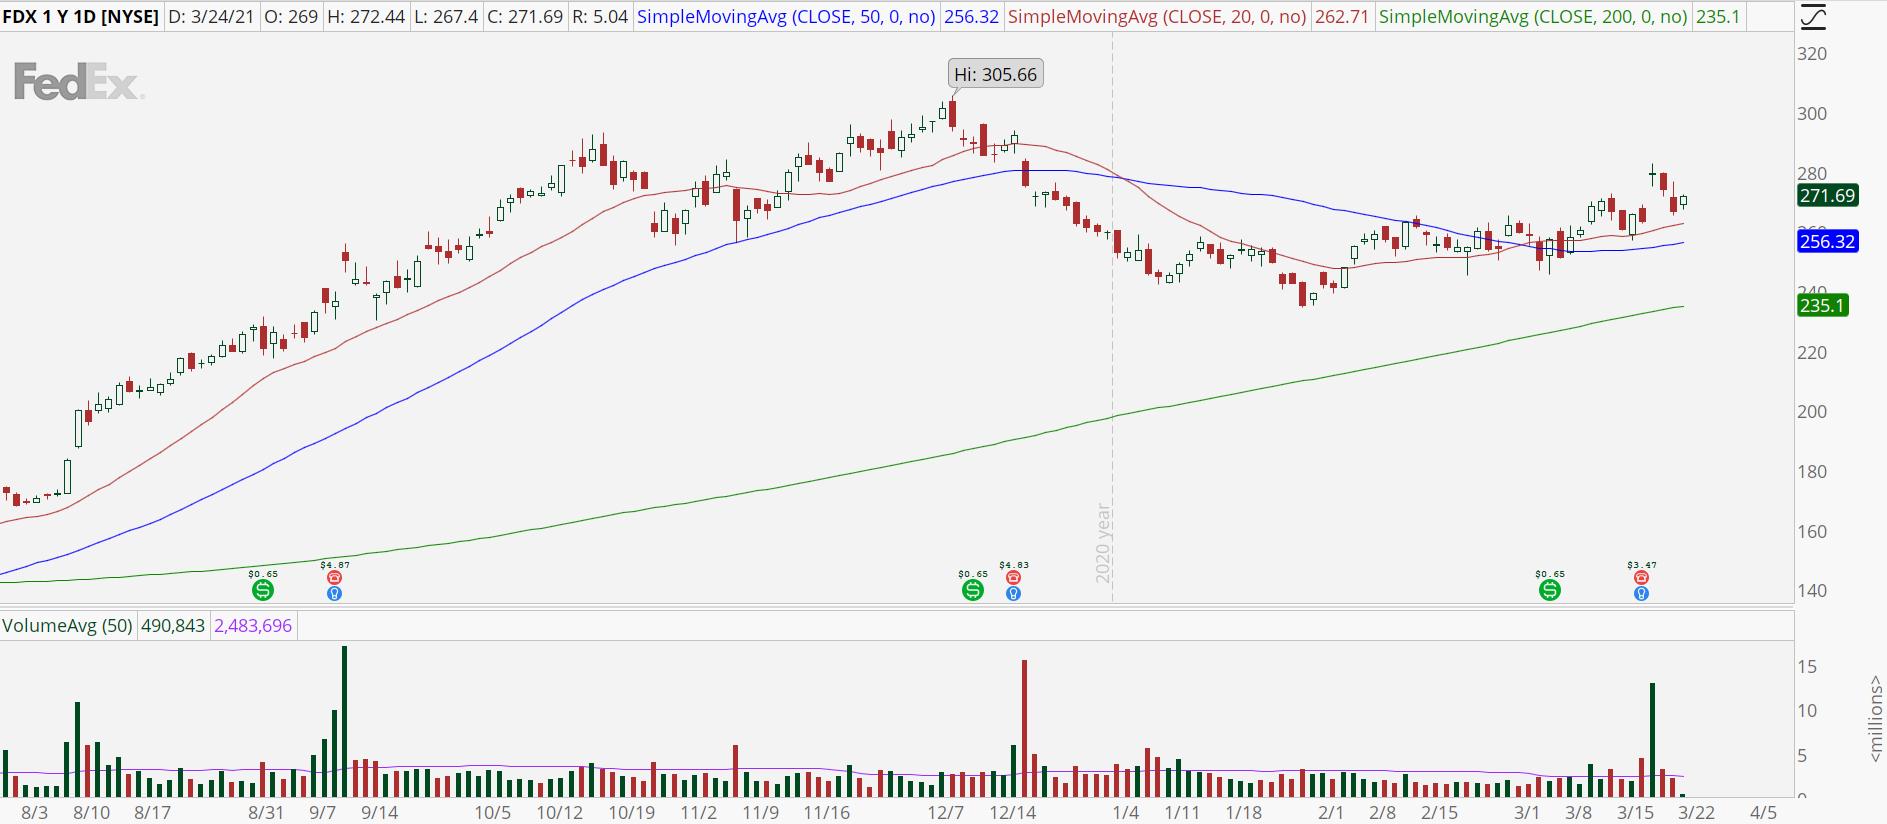 FedEx (FDX) stock chart with gap fill